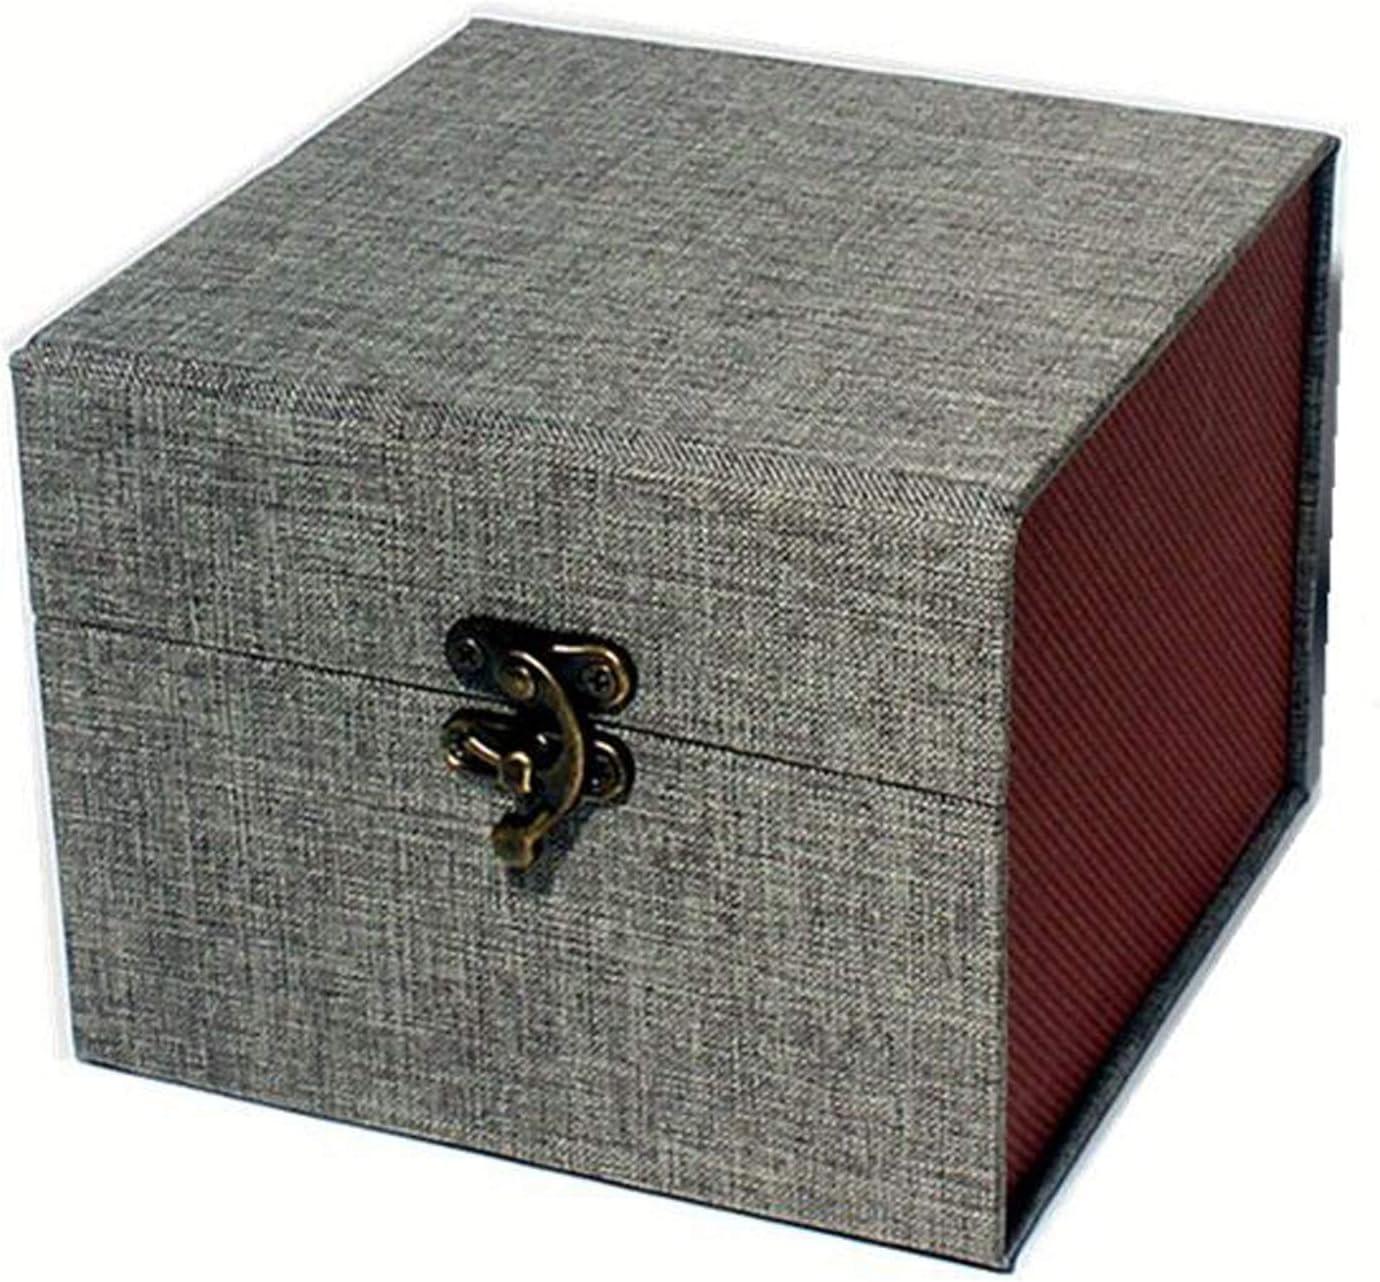 Storage Box with Sponge, Decorative Box Vintage Handmade Craft Box Fragile Gift Box and Home Decor, Azure, 5 x 5 x 4 inch